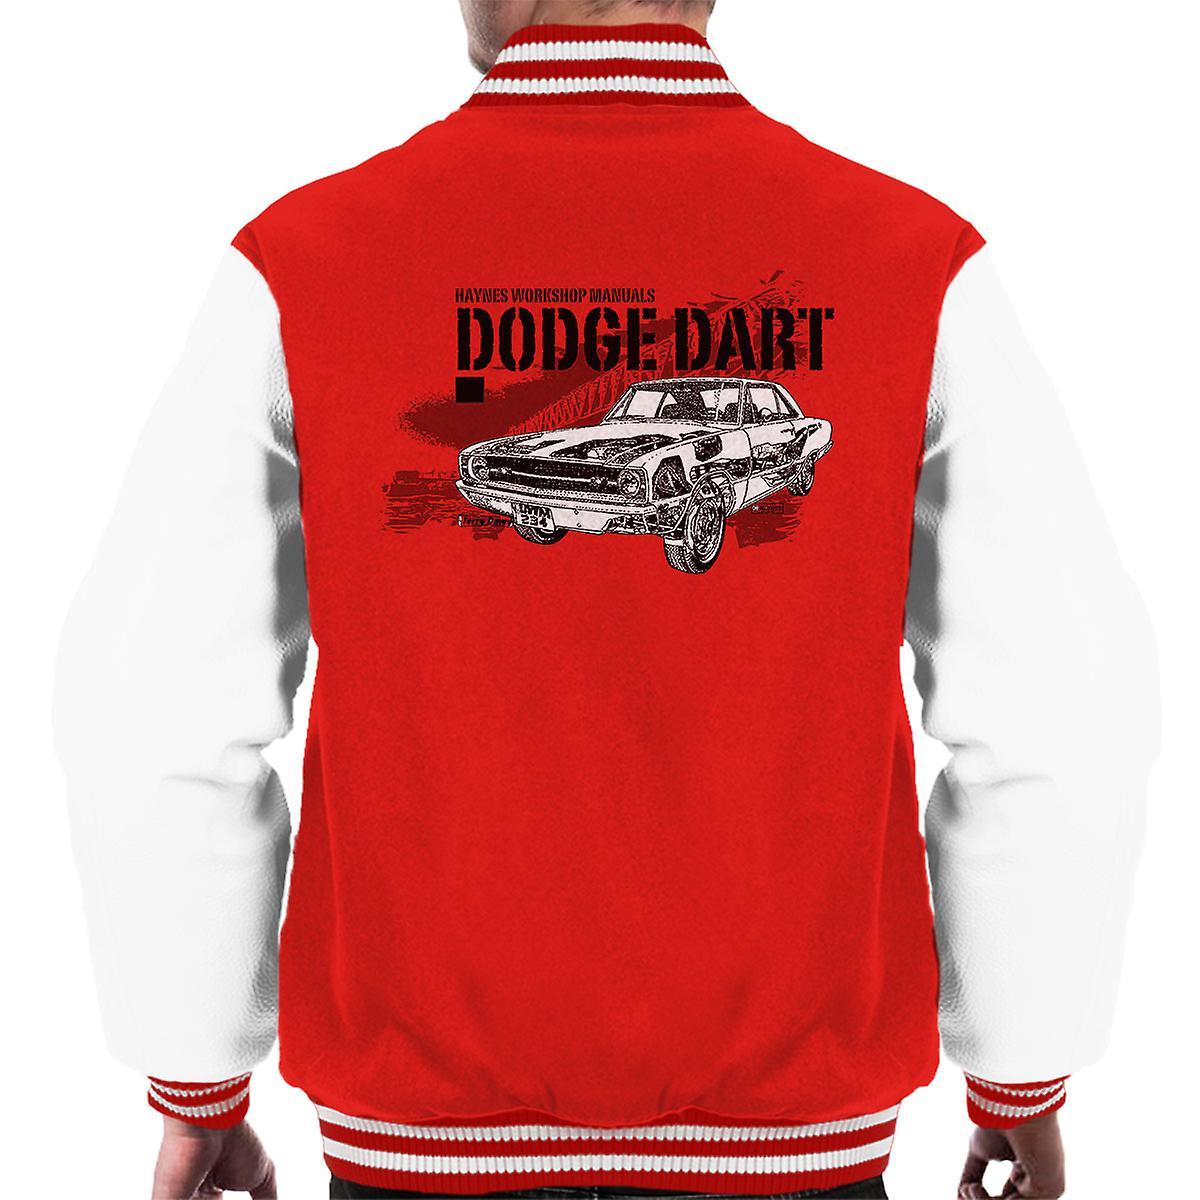 Haynes eiere Workshop manuell Dodge Dart svart menn Varsity jakke